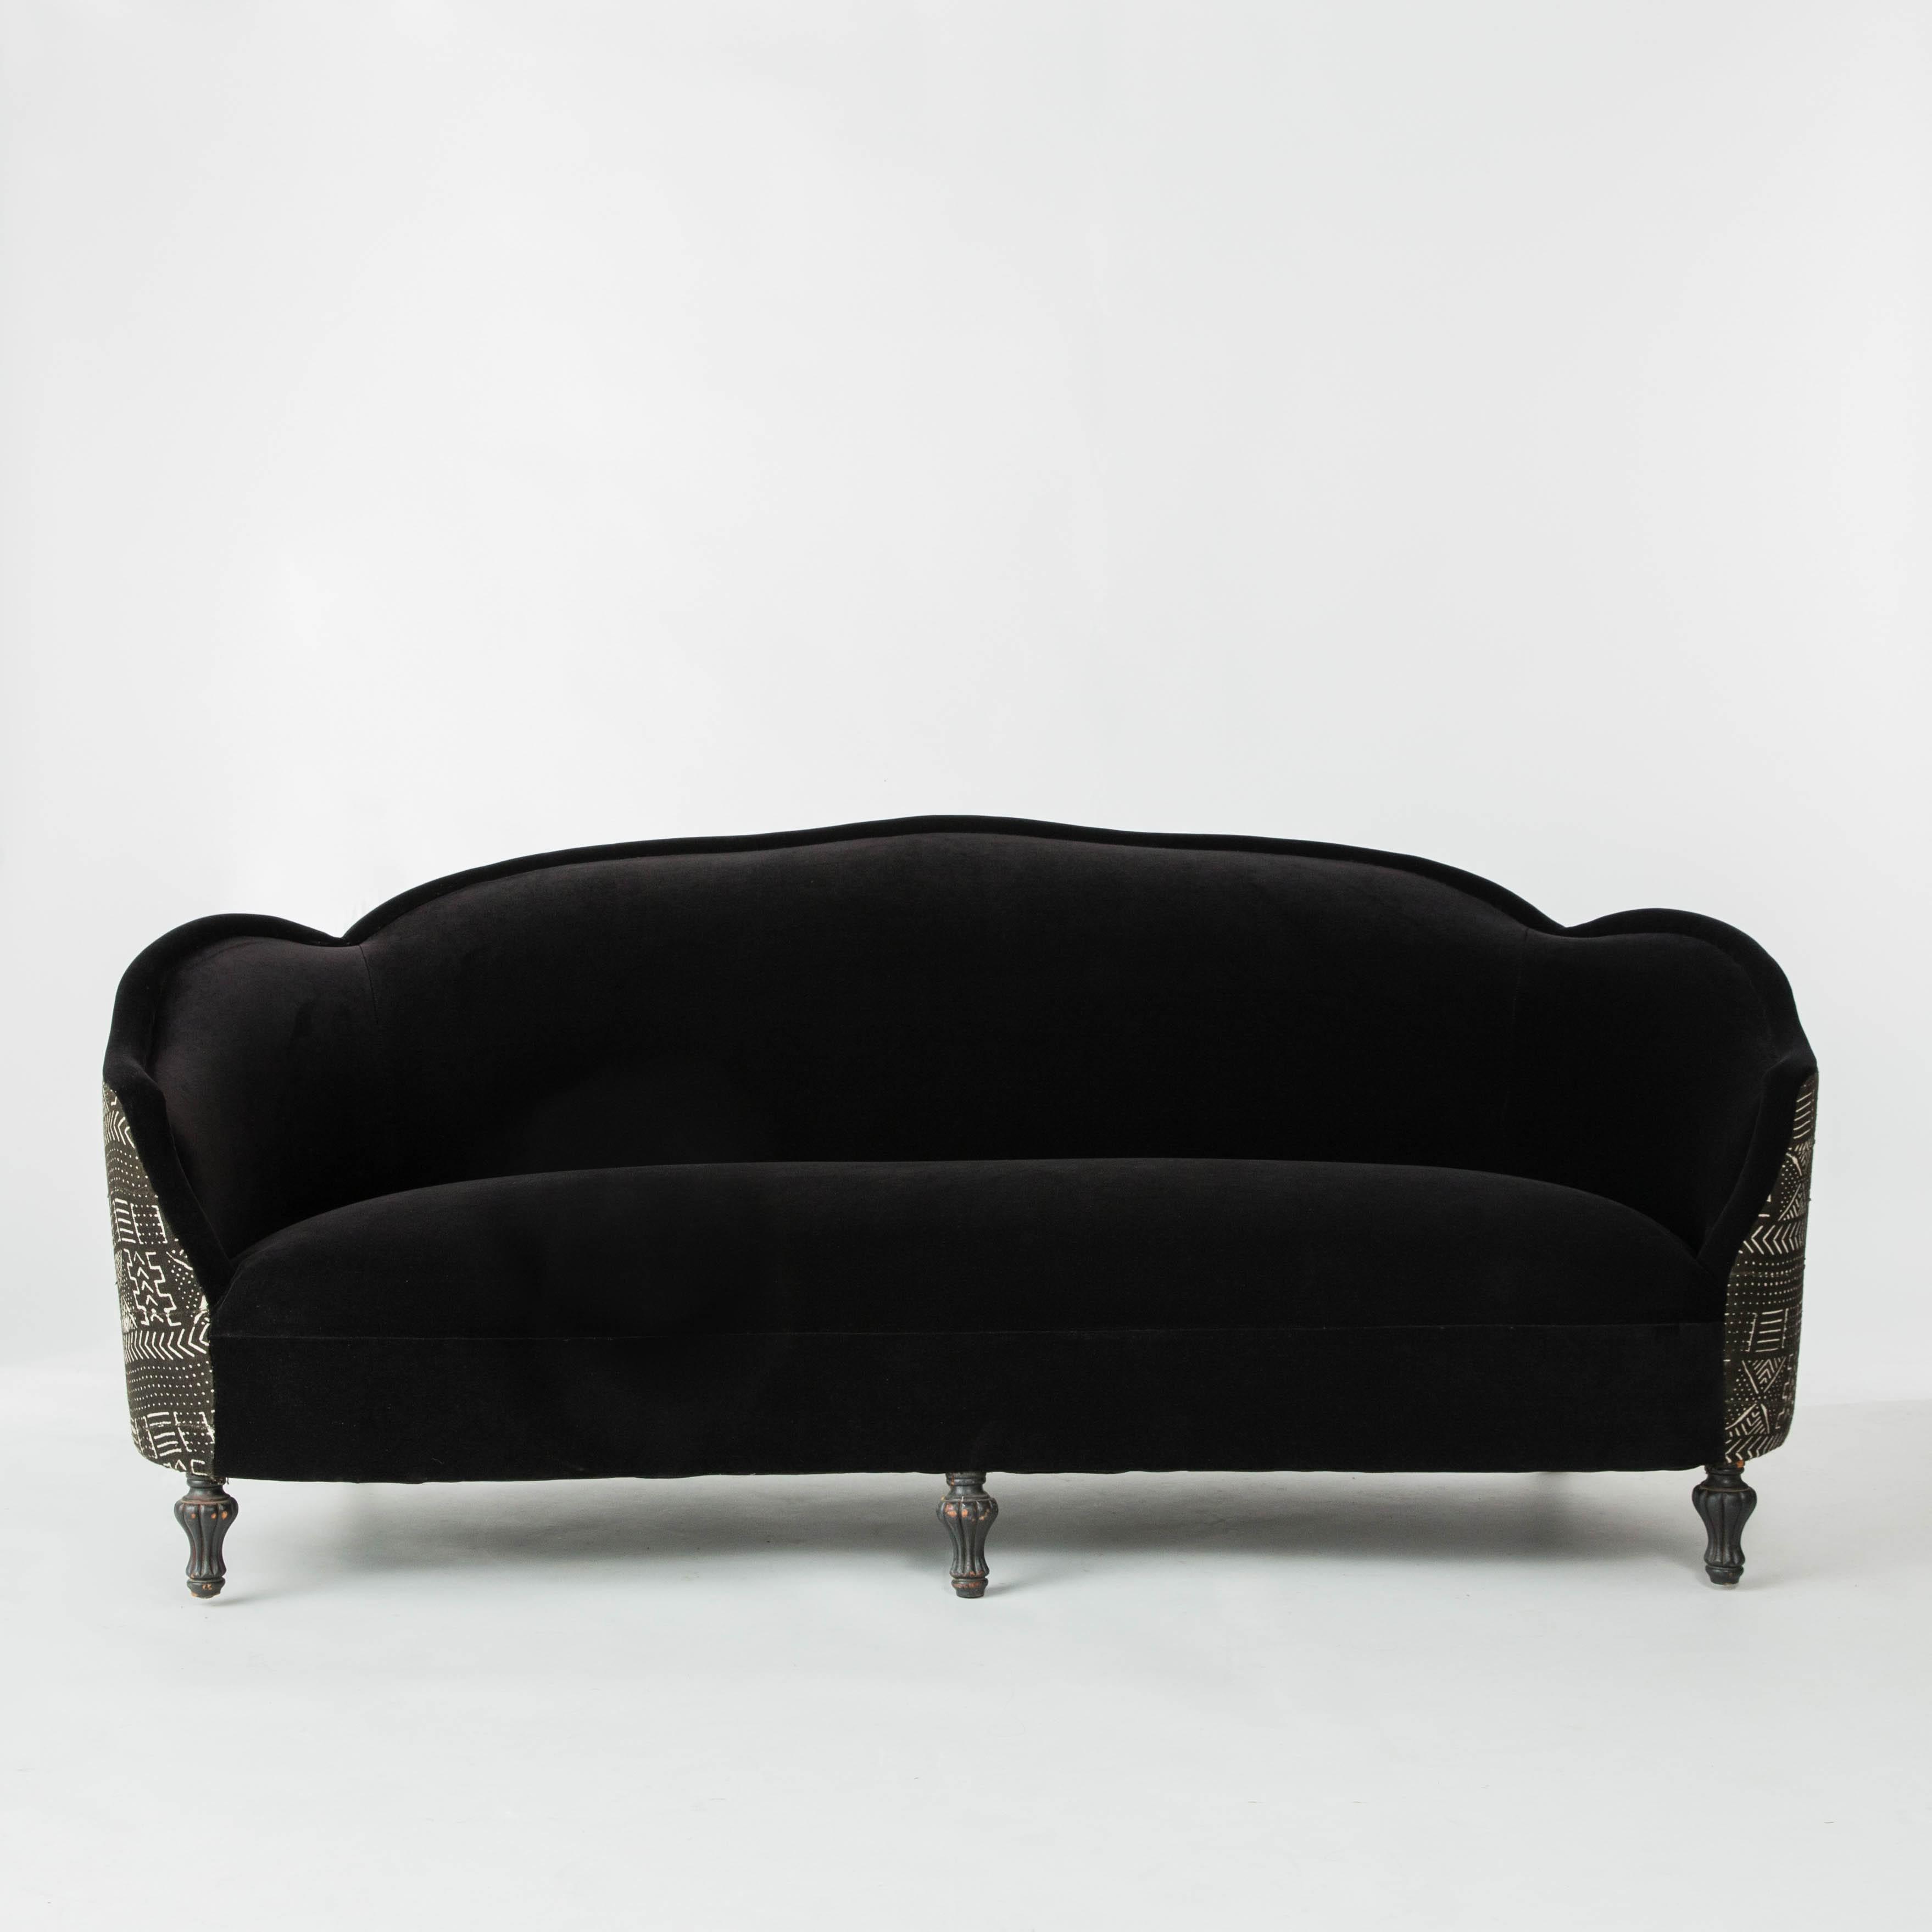 Wondrous Josephine Sofa Creativecarmelina Interior Chair Design Creativecarmelinacom